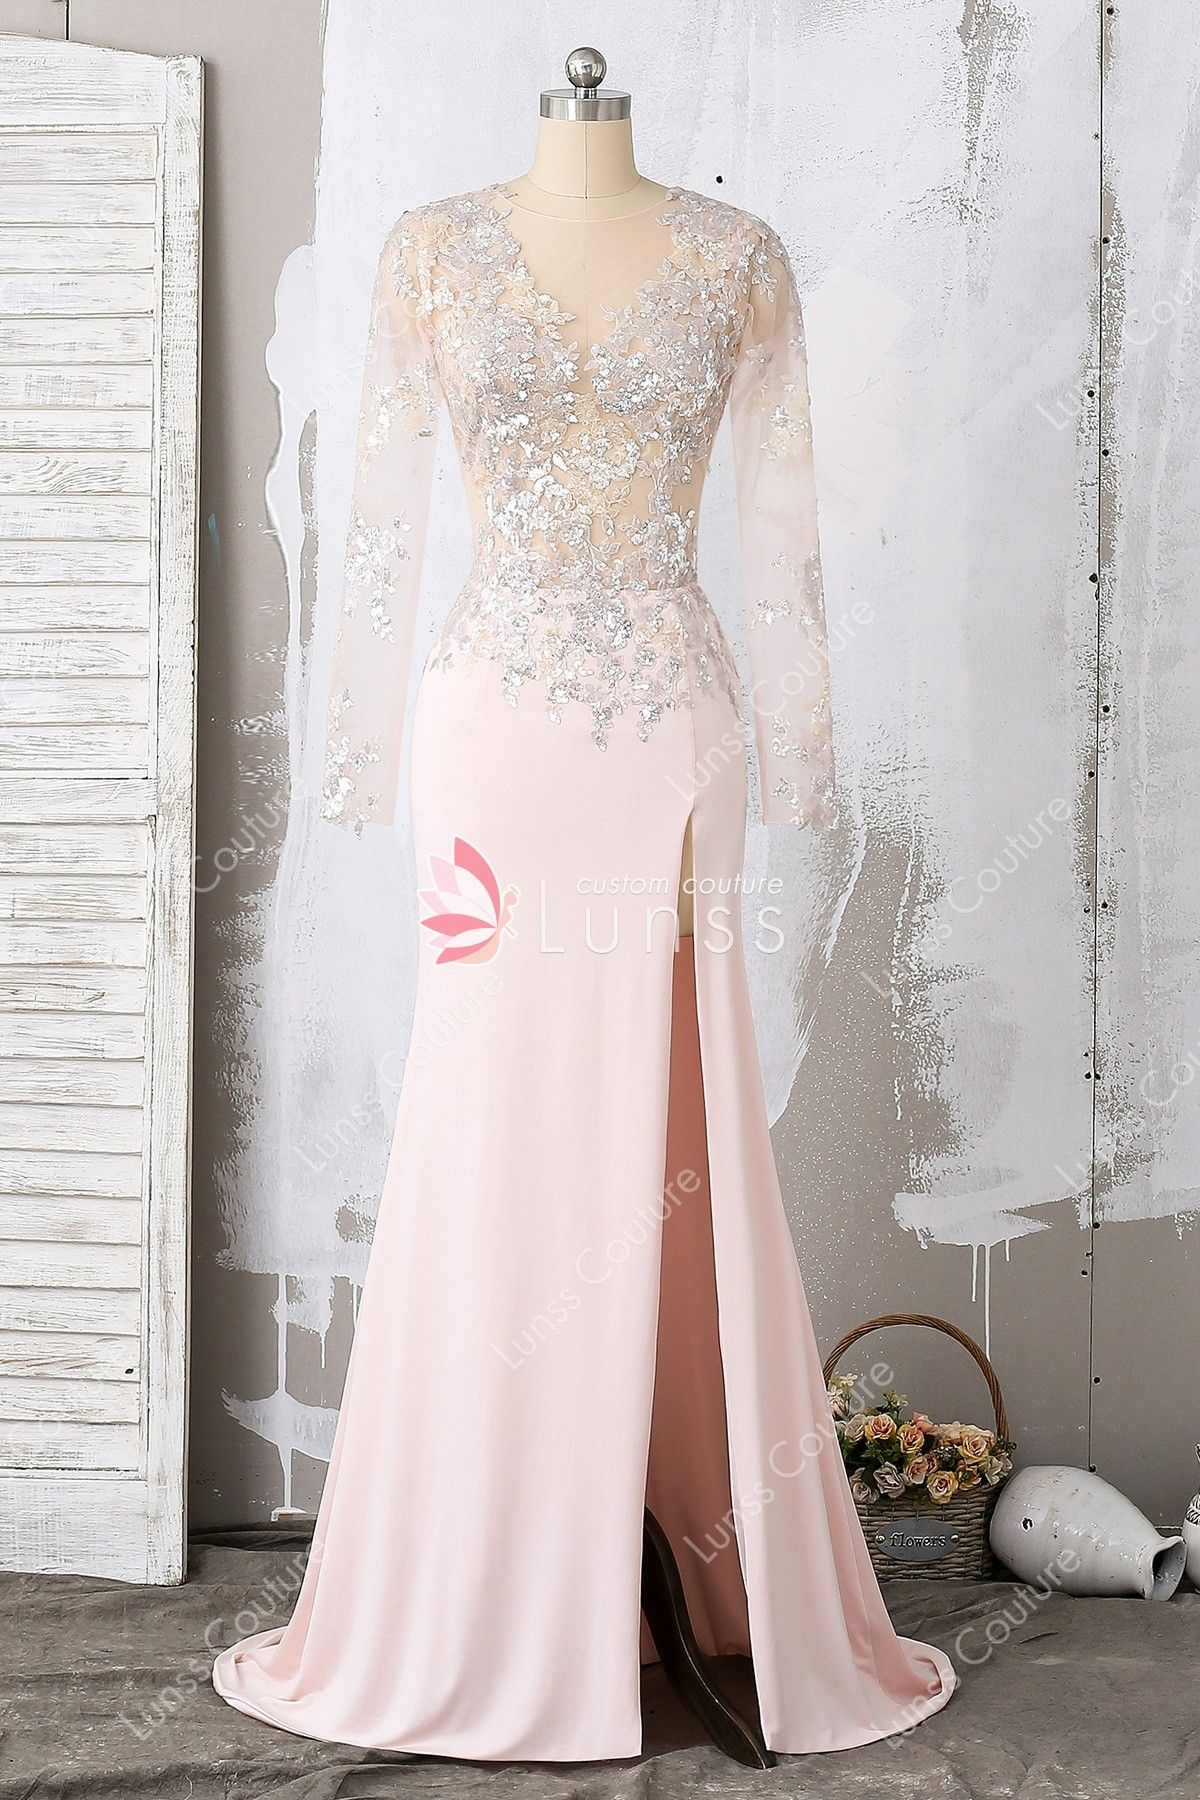 Blush sequin applique long sleeve mermaid prom dress